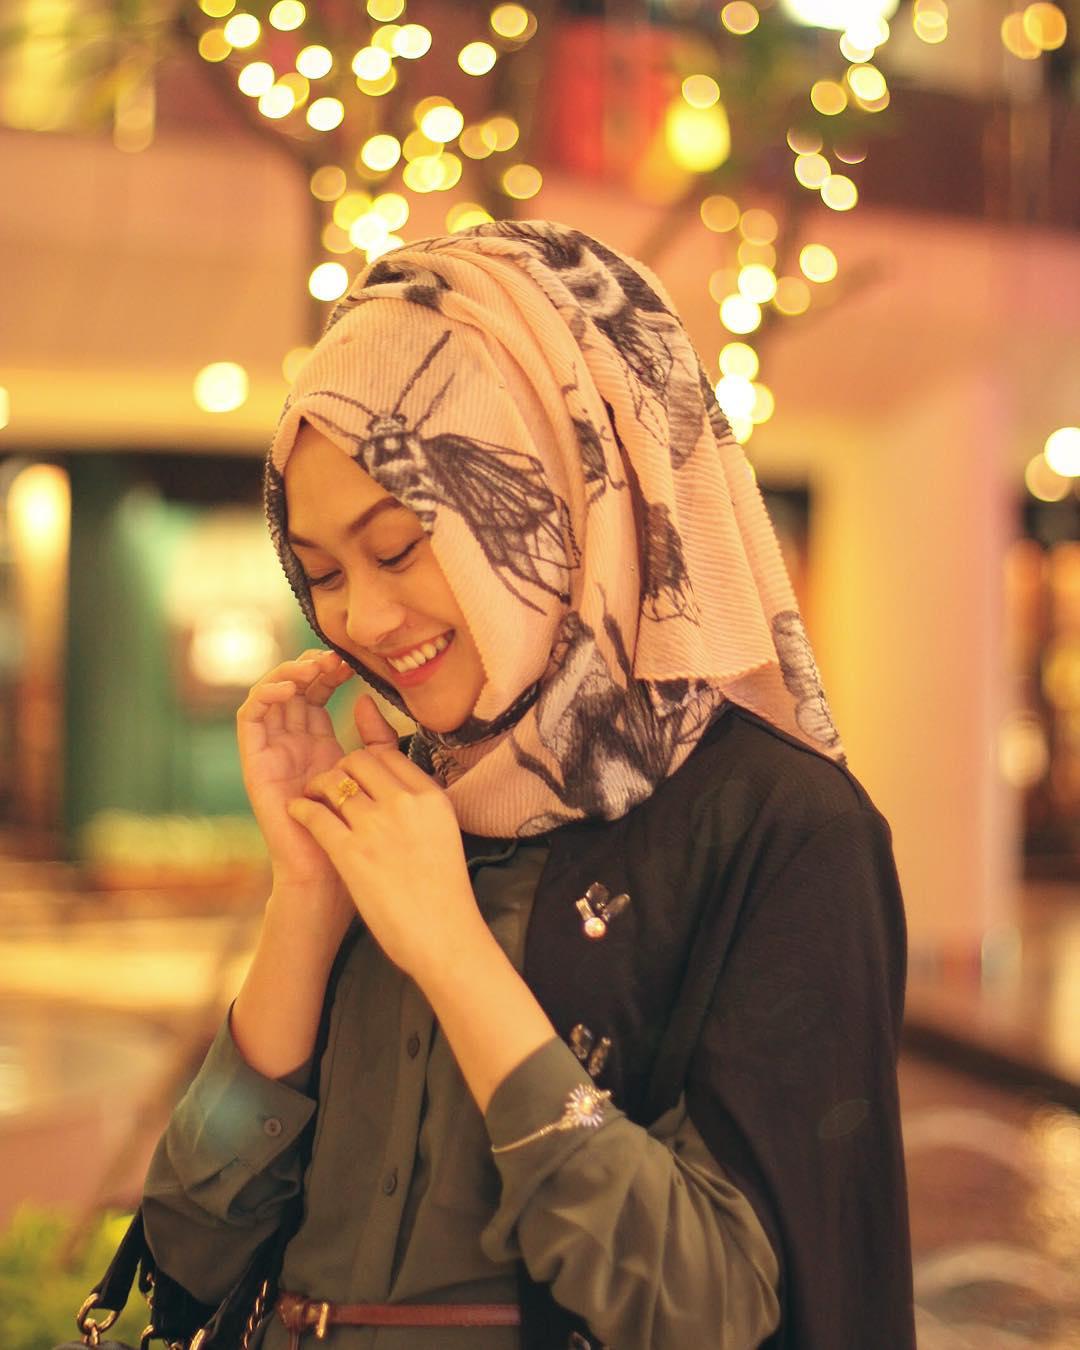 fashion blogger berhijab hijabers muslimah indonesia cakep populer sukses desainer designer ngehits instagram vlogger kekinian outfit of the day ootd tips pakaian busana cantik kecantikan inspirasi referensi hijab syari pashmina tutorial video